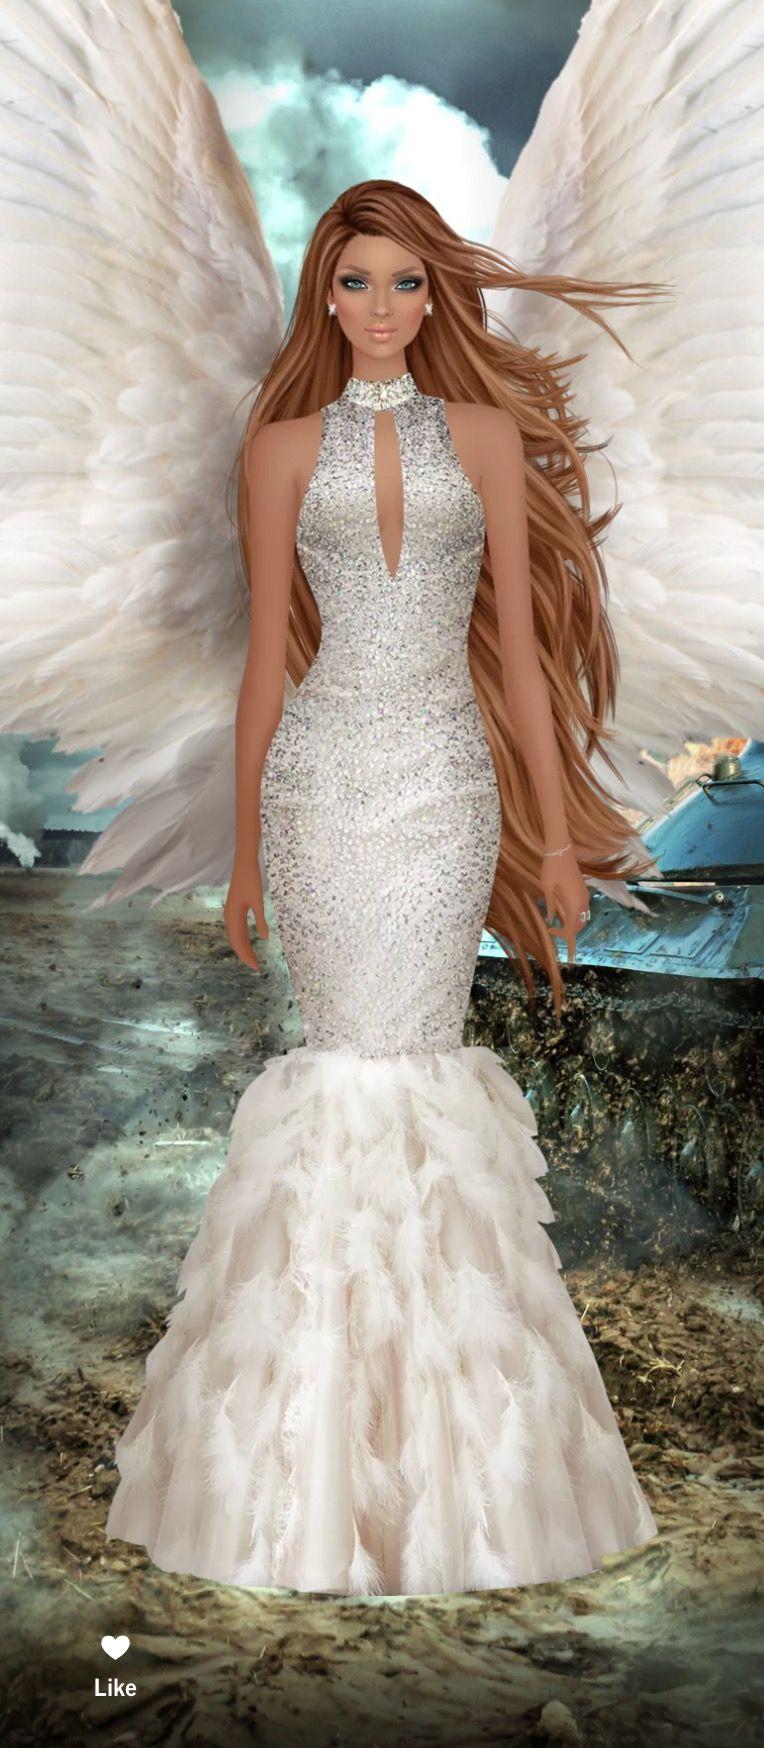 Pin de Carmen hb en Covet fashion - vestidos largos | Pinterest ...